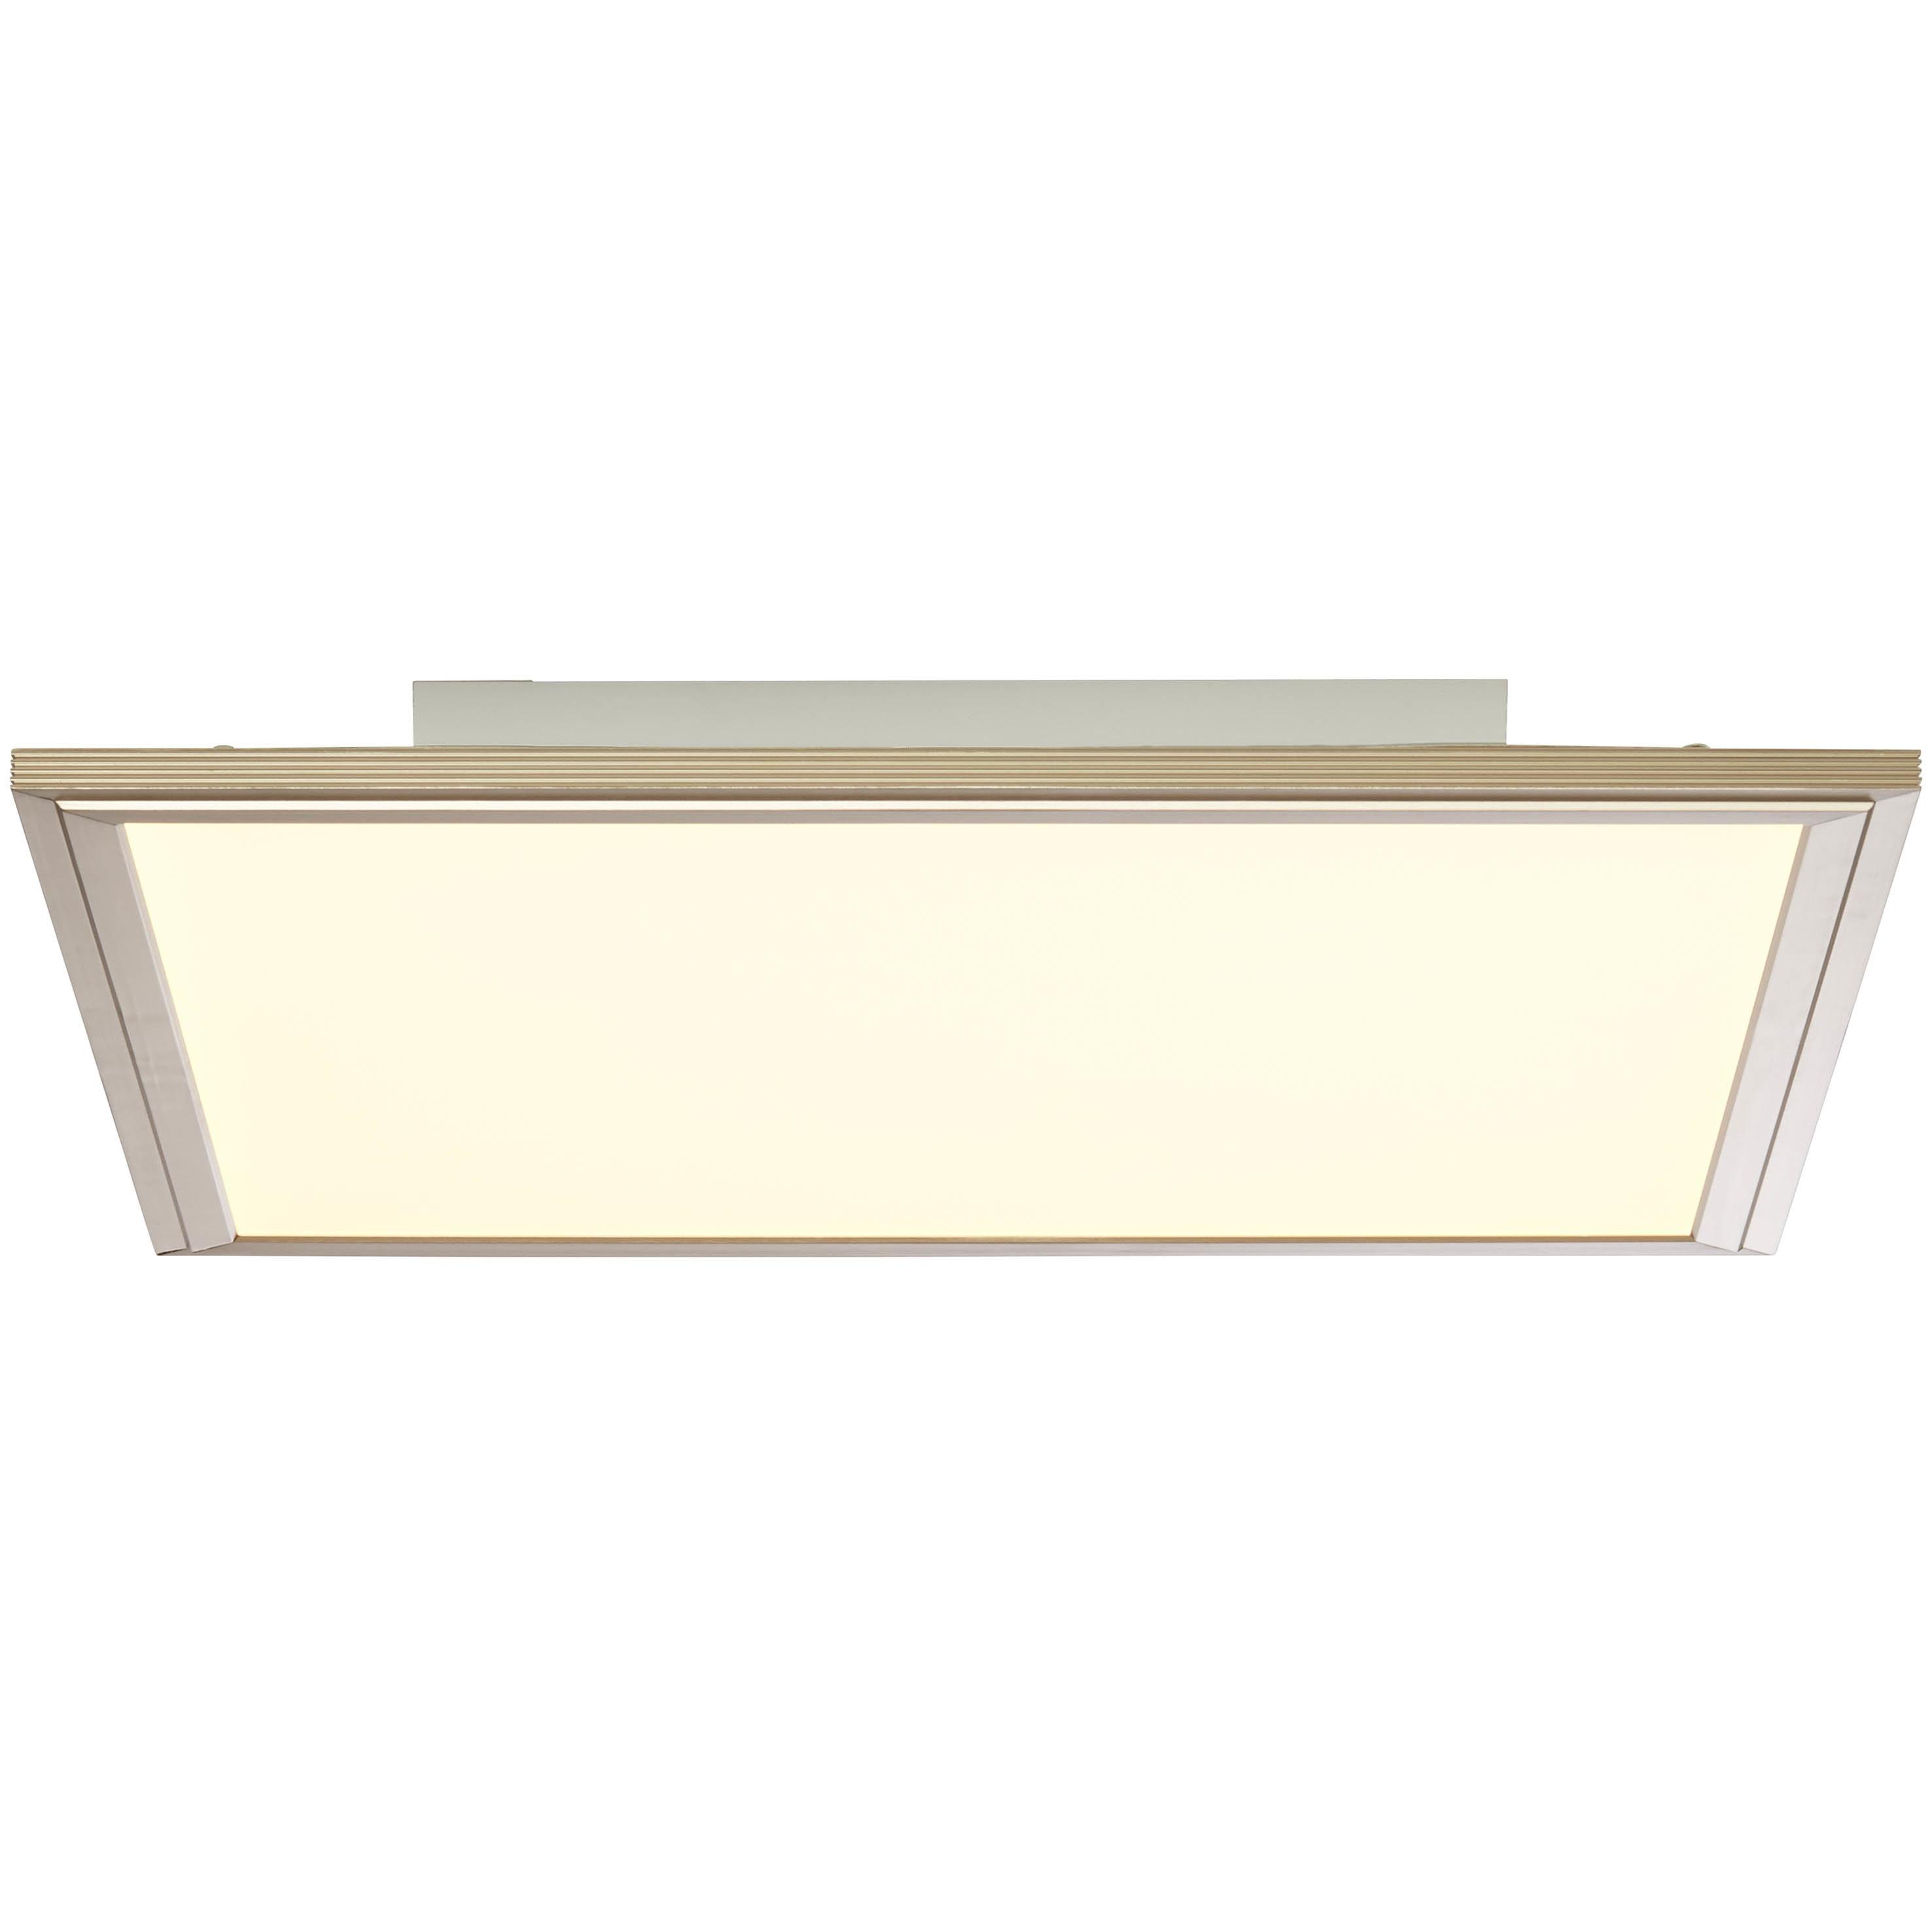 Brilliant Leuchten Flat RGB LED Deckenaufbau-Paneel 42x42cm nickel eloxiert